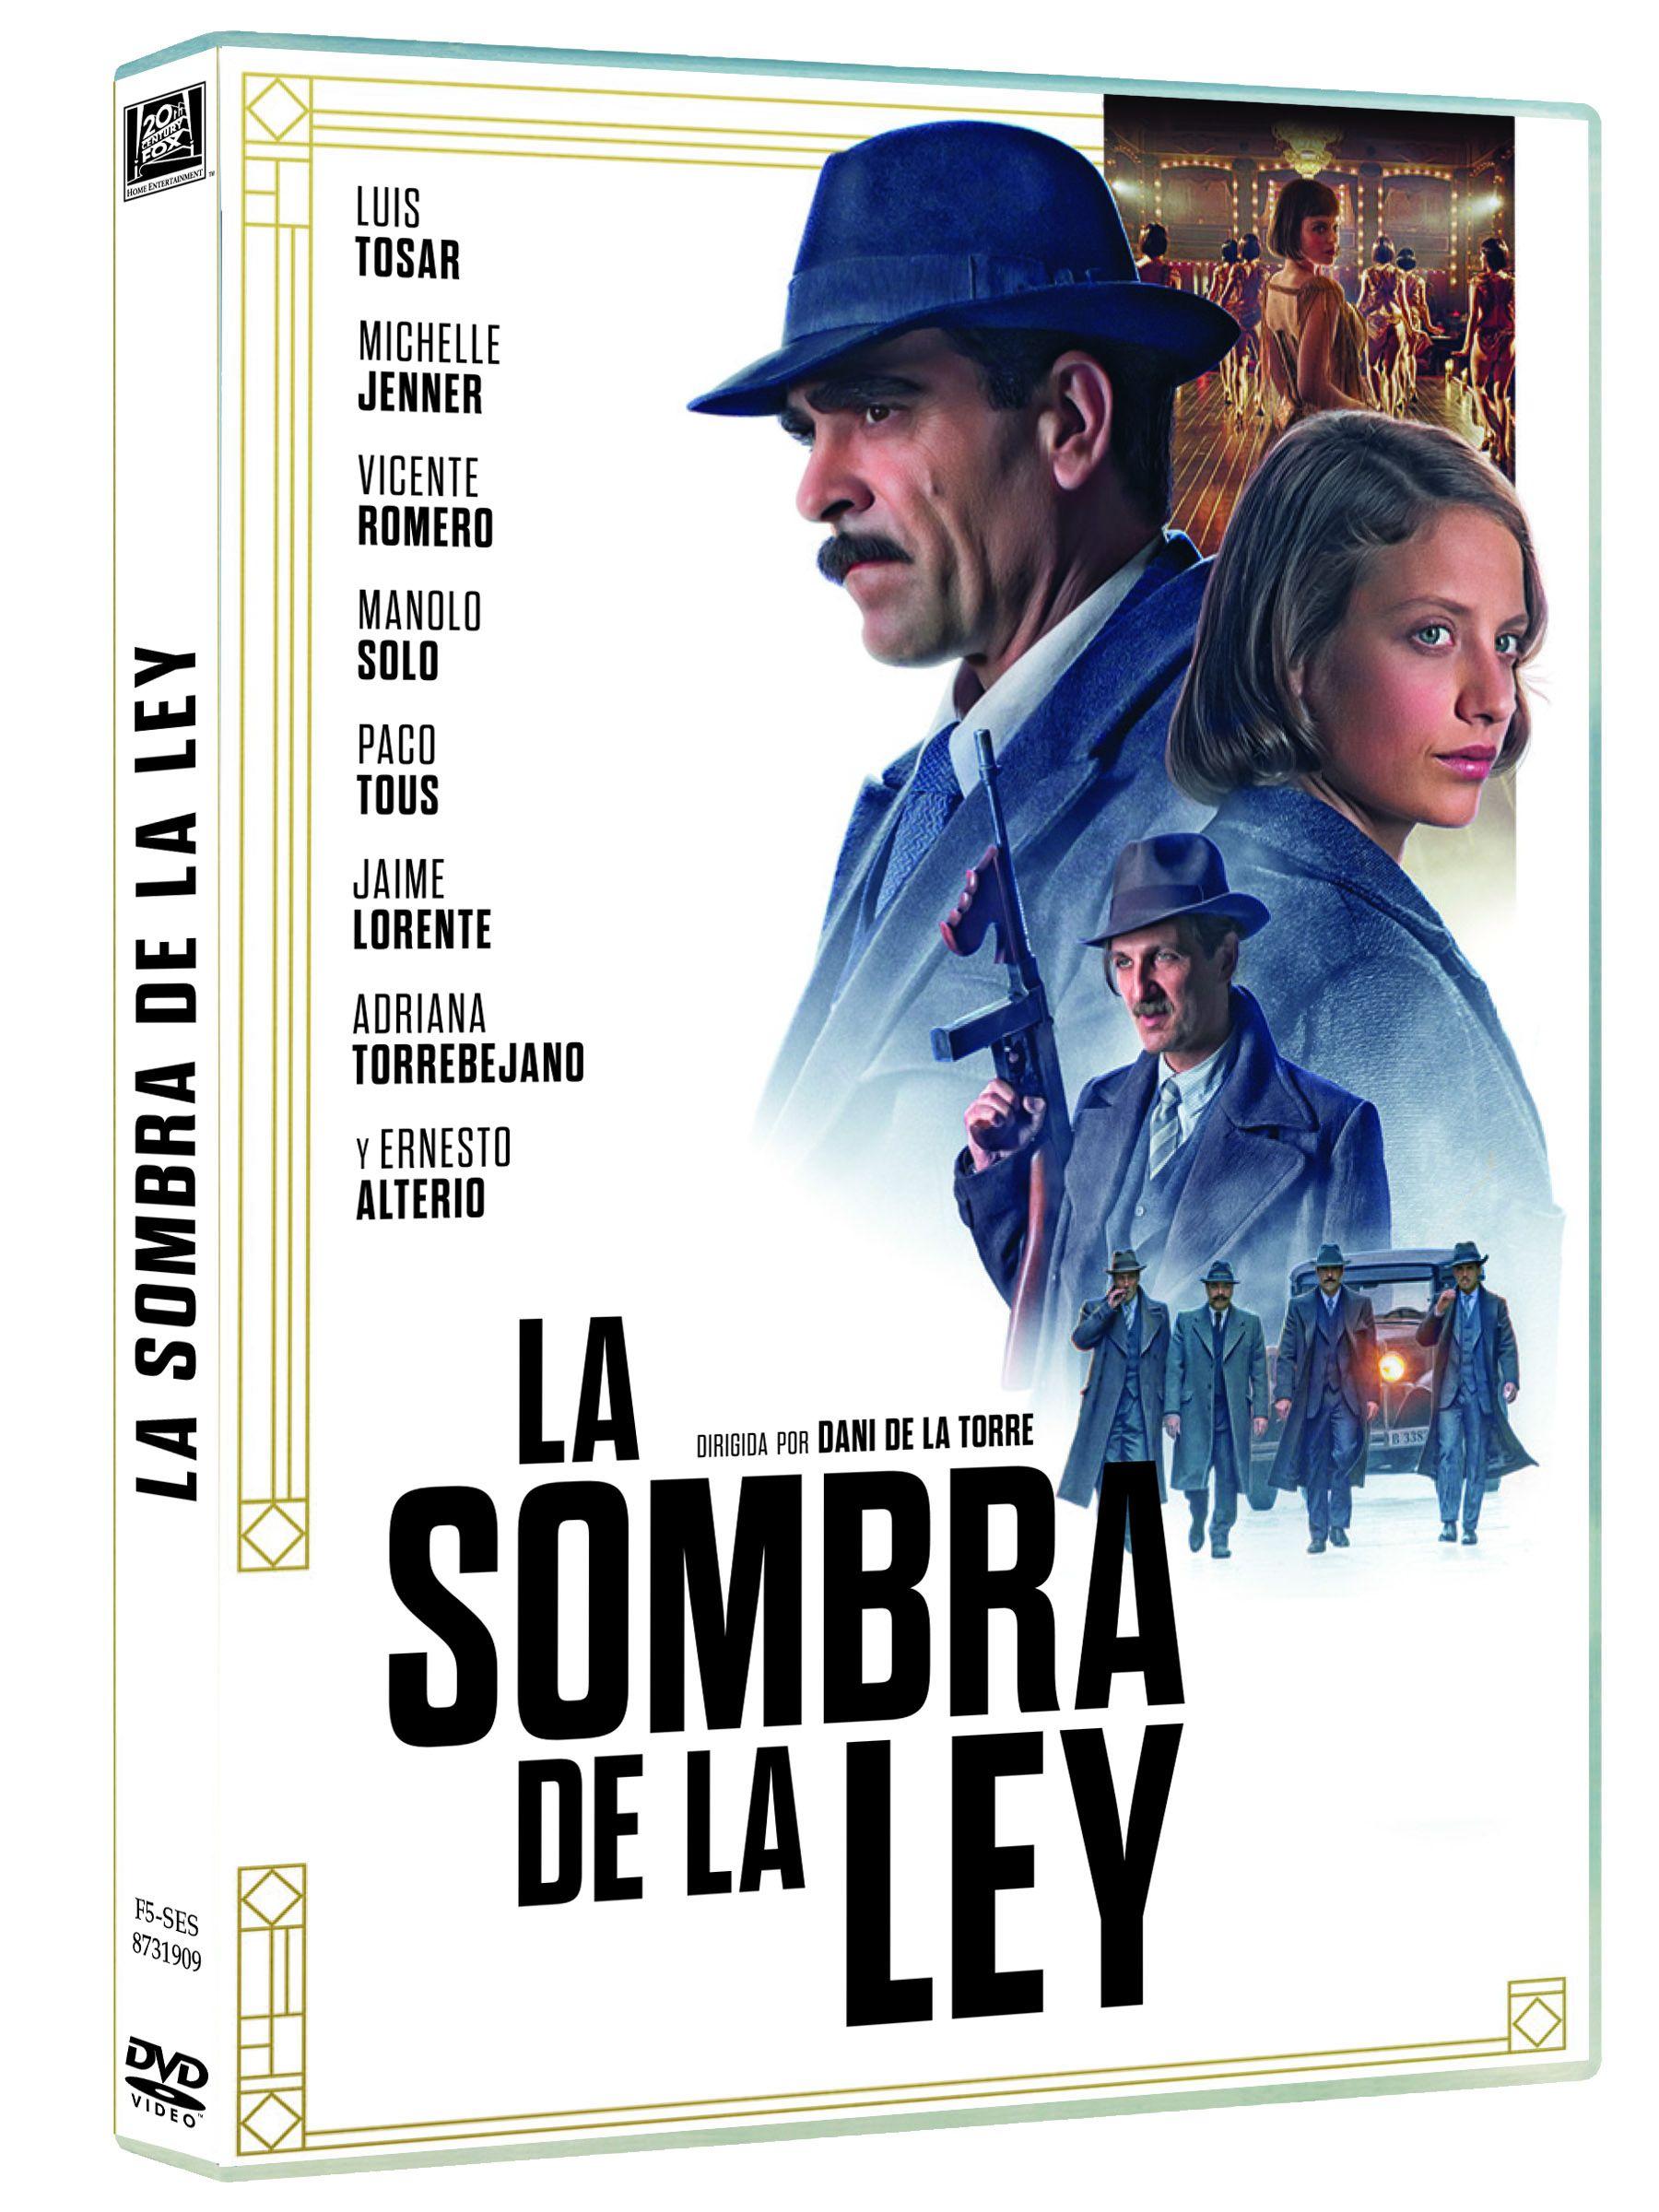 la sombra de la ley - dvd --8420266020802